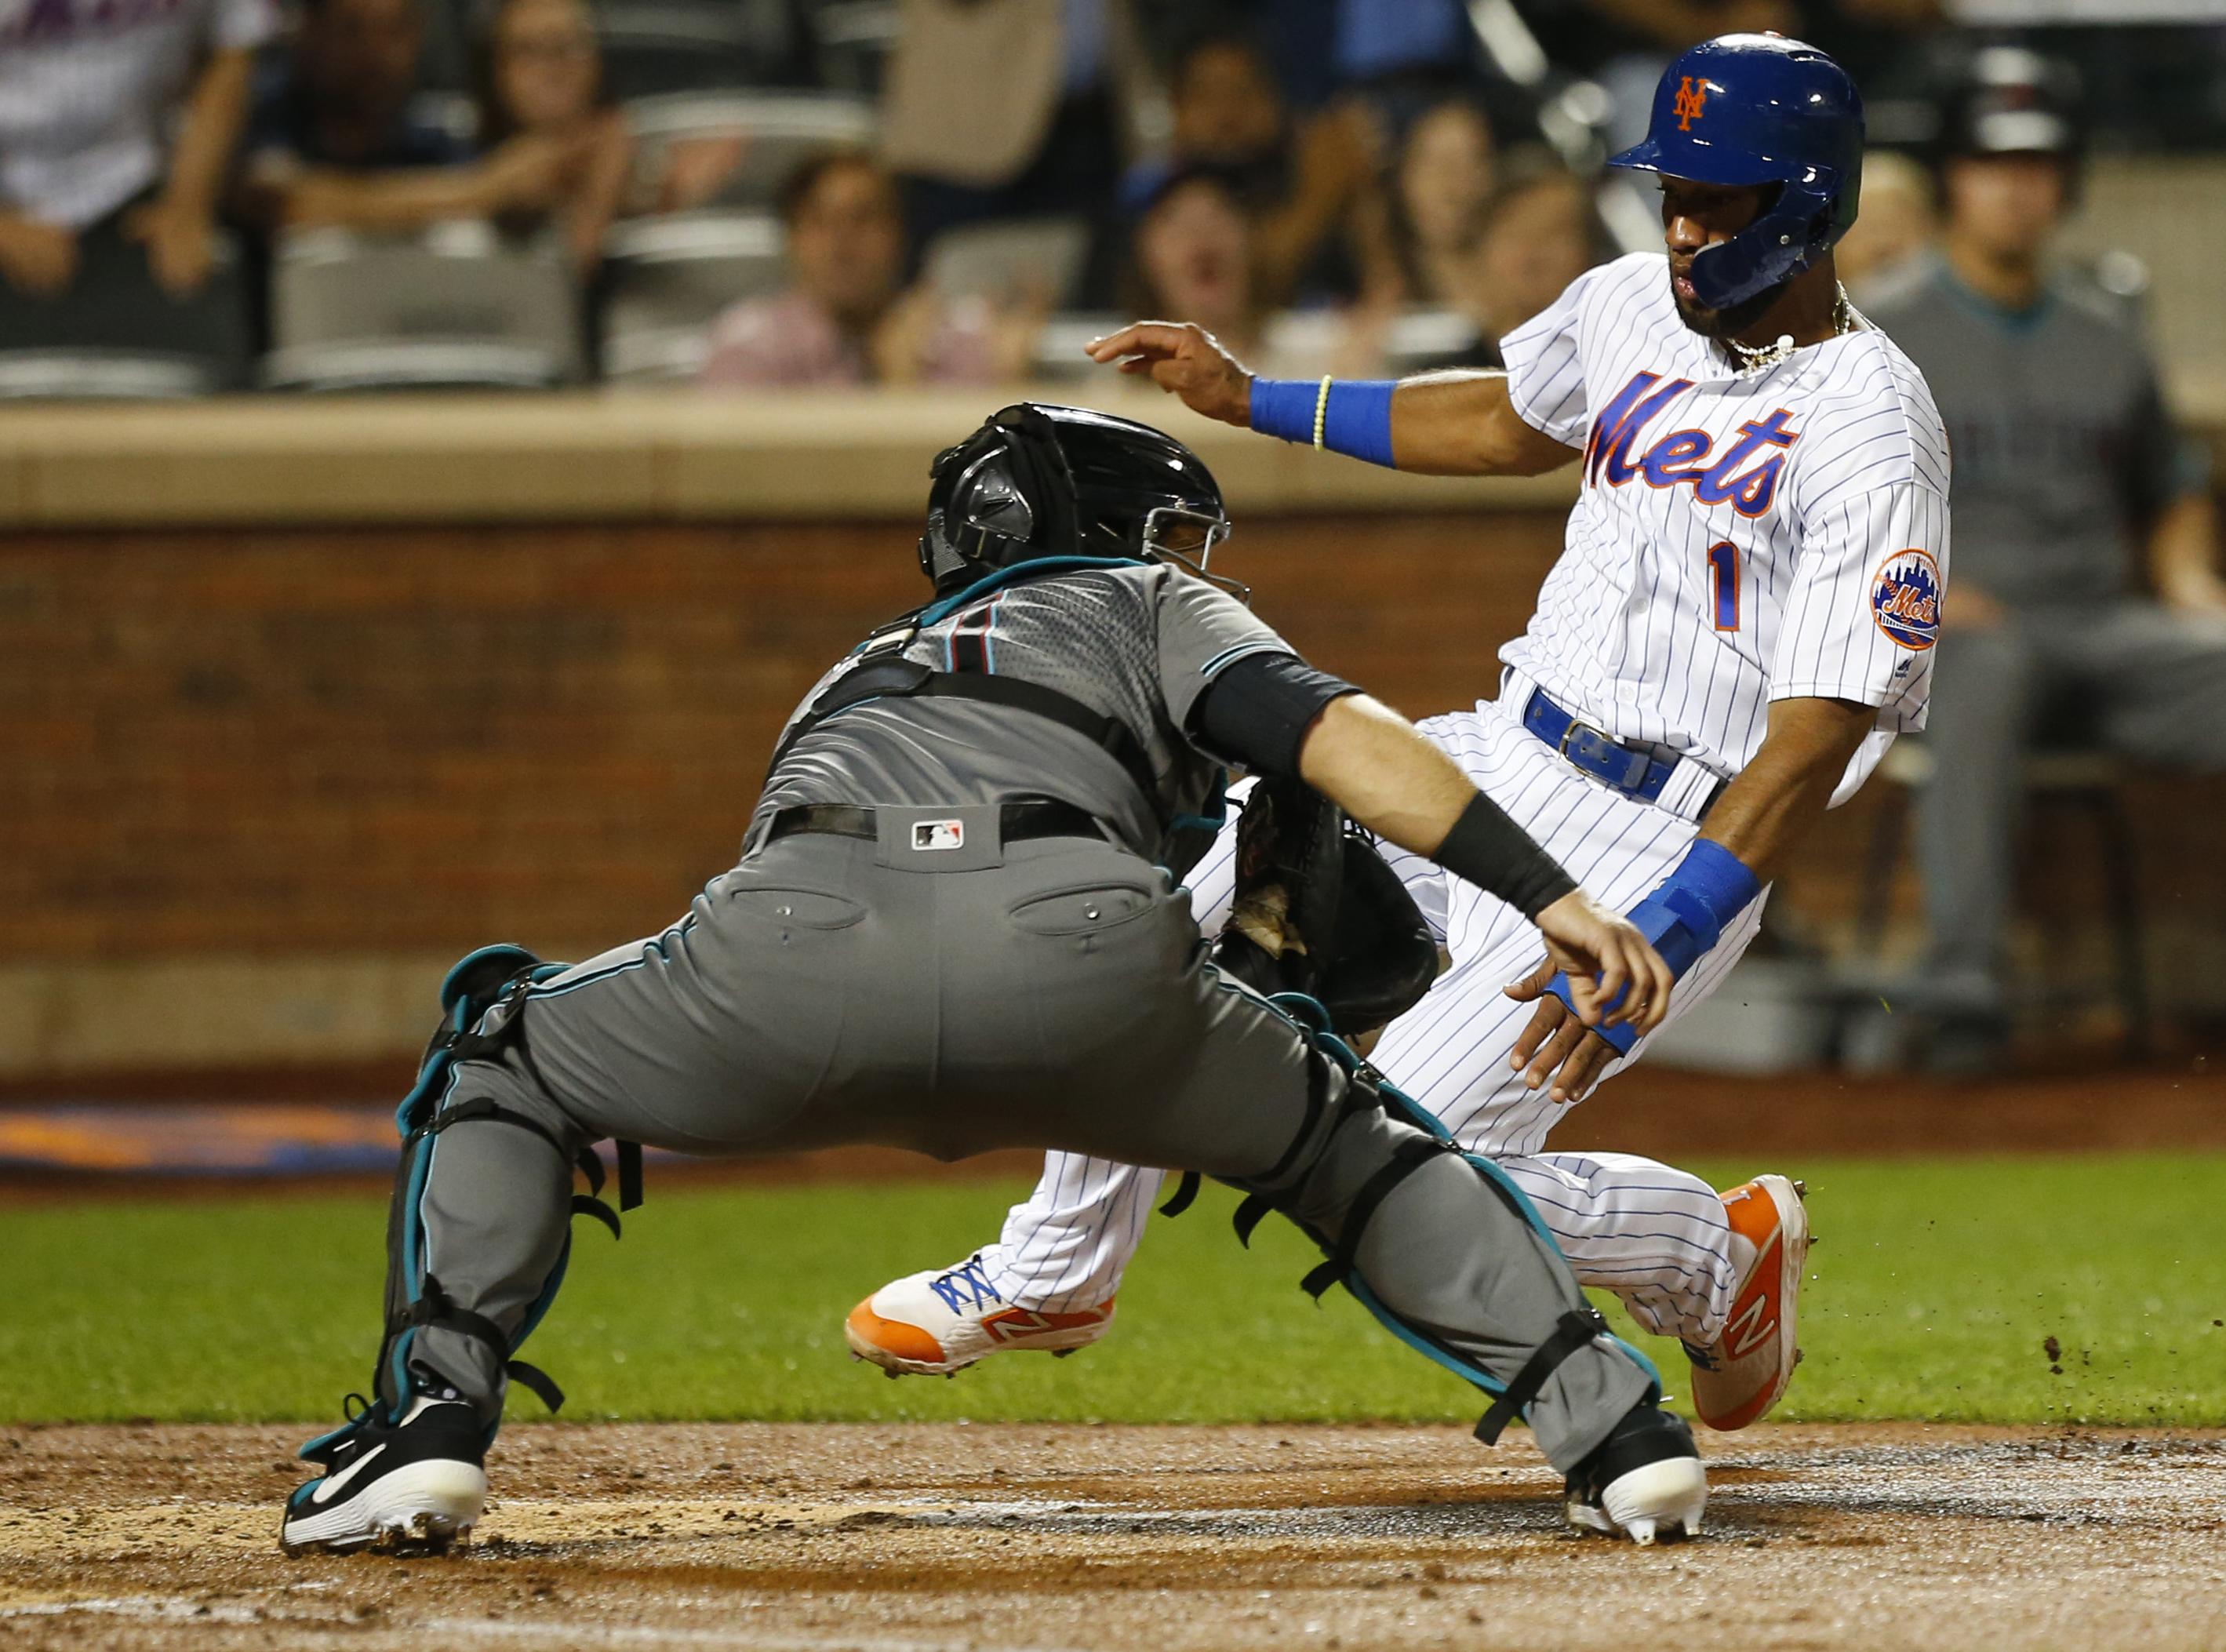 9/11/19 Game Preview: Arizona Diamondbacks at New York Mets